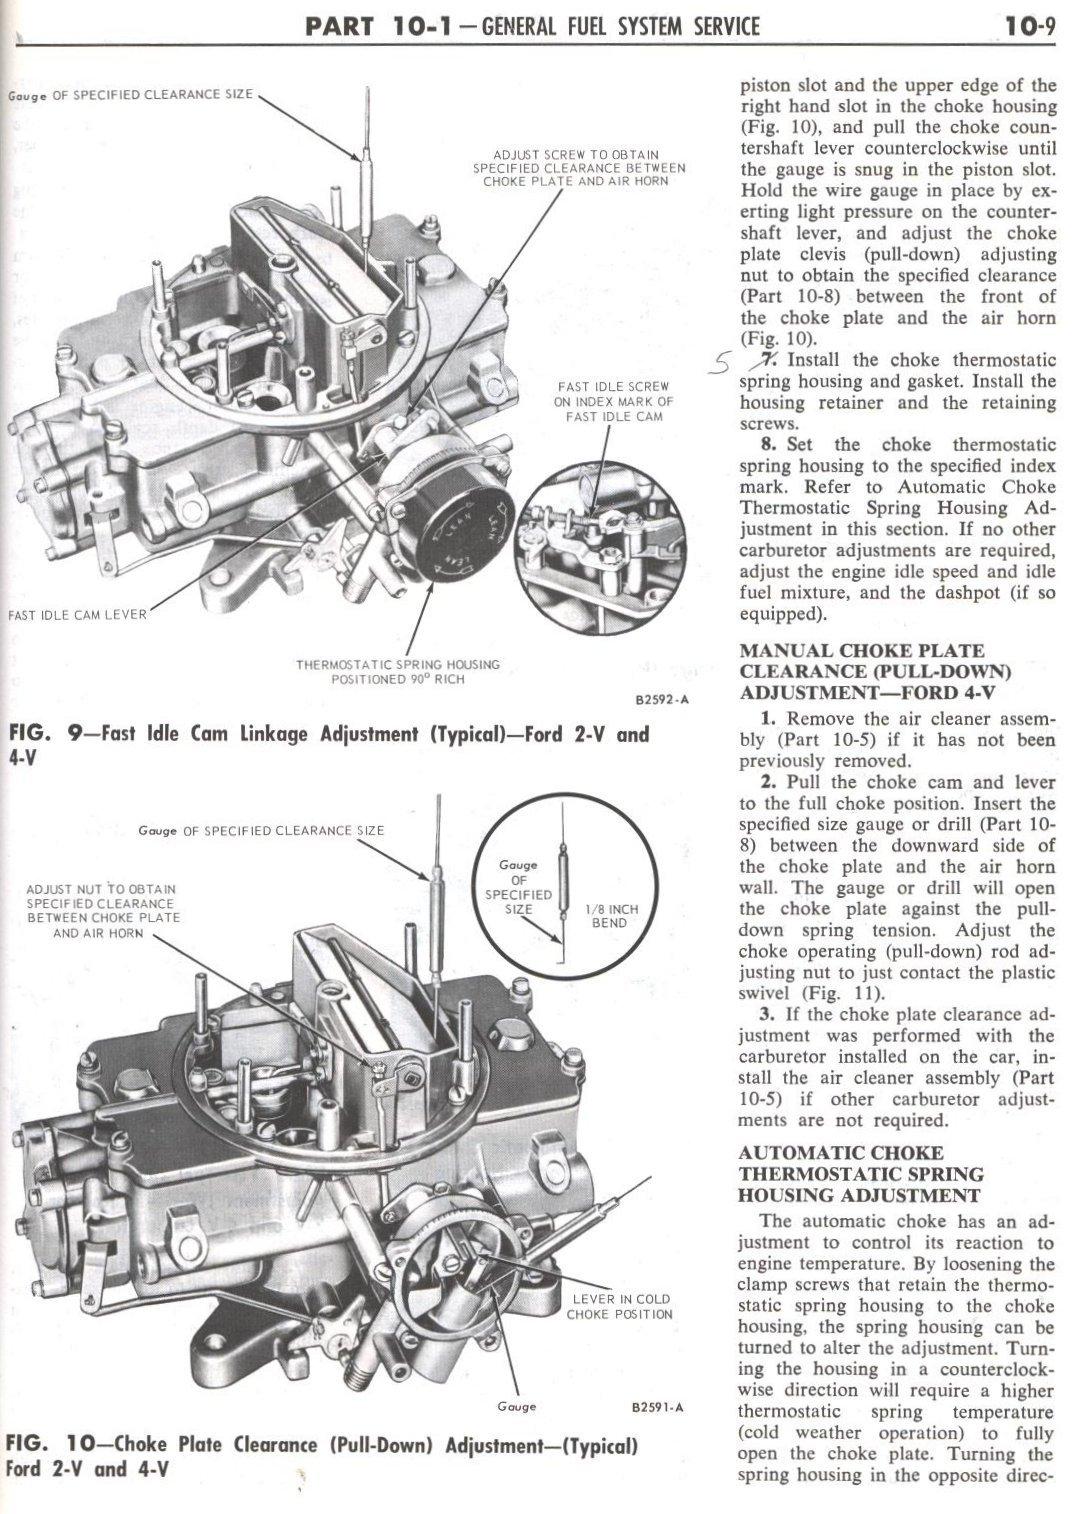 1965 Mustang Carburetor Diagram Trusted Wiring Diagram \u2022 Ford Inline 6  Crate Engine 1965 Ford 6 Cylinder Engine Diagram